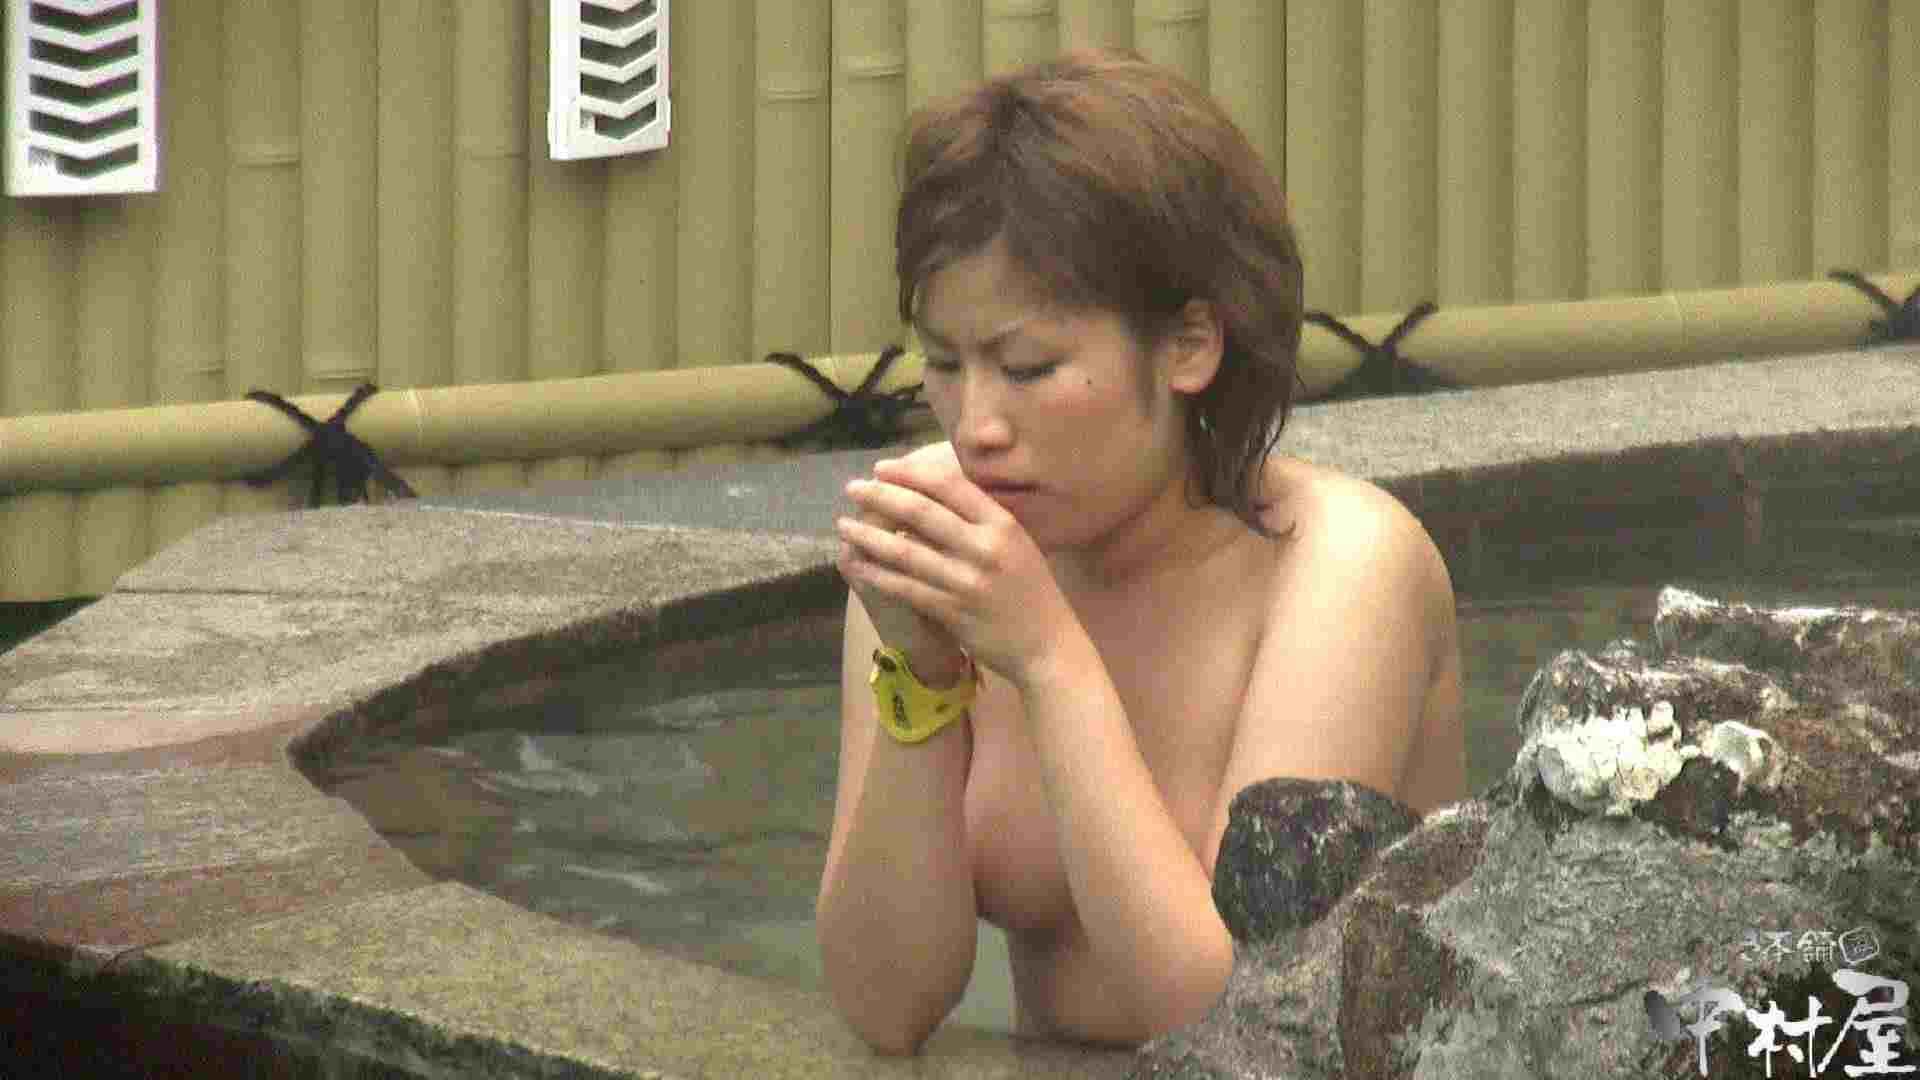 Aquaな露天風呂Vol.918 0  55連発 26